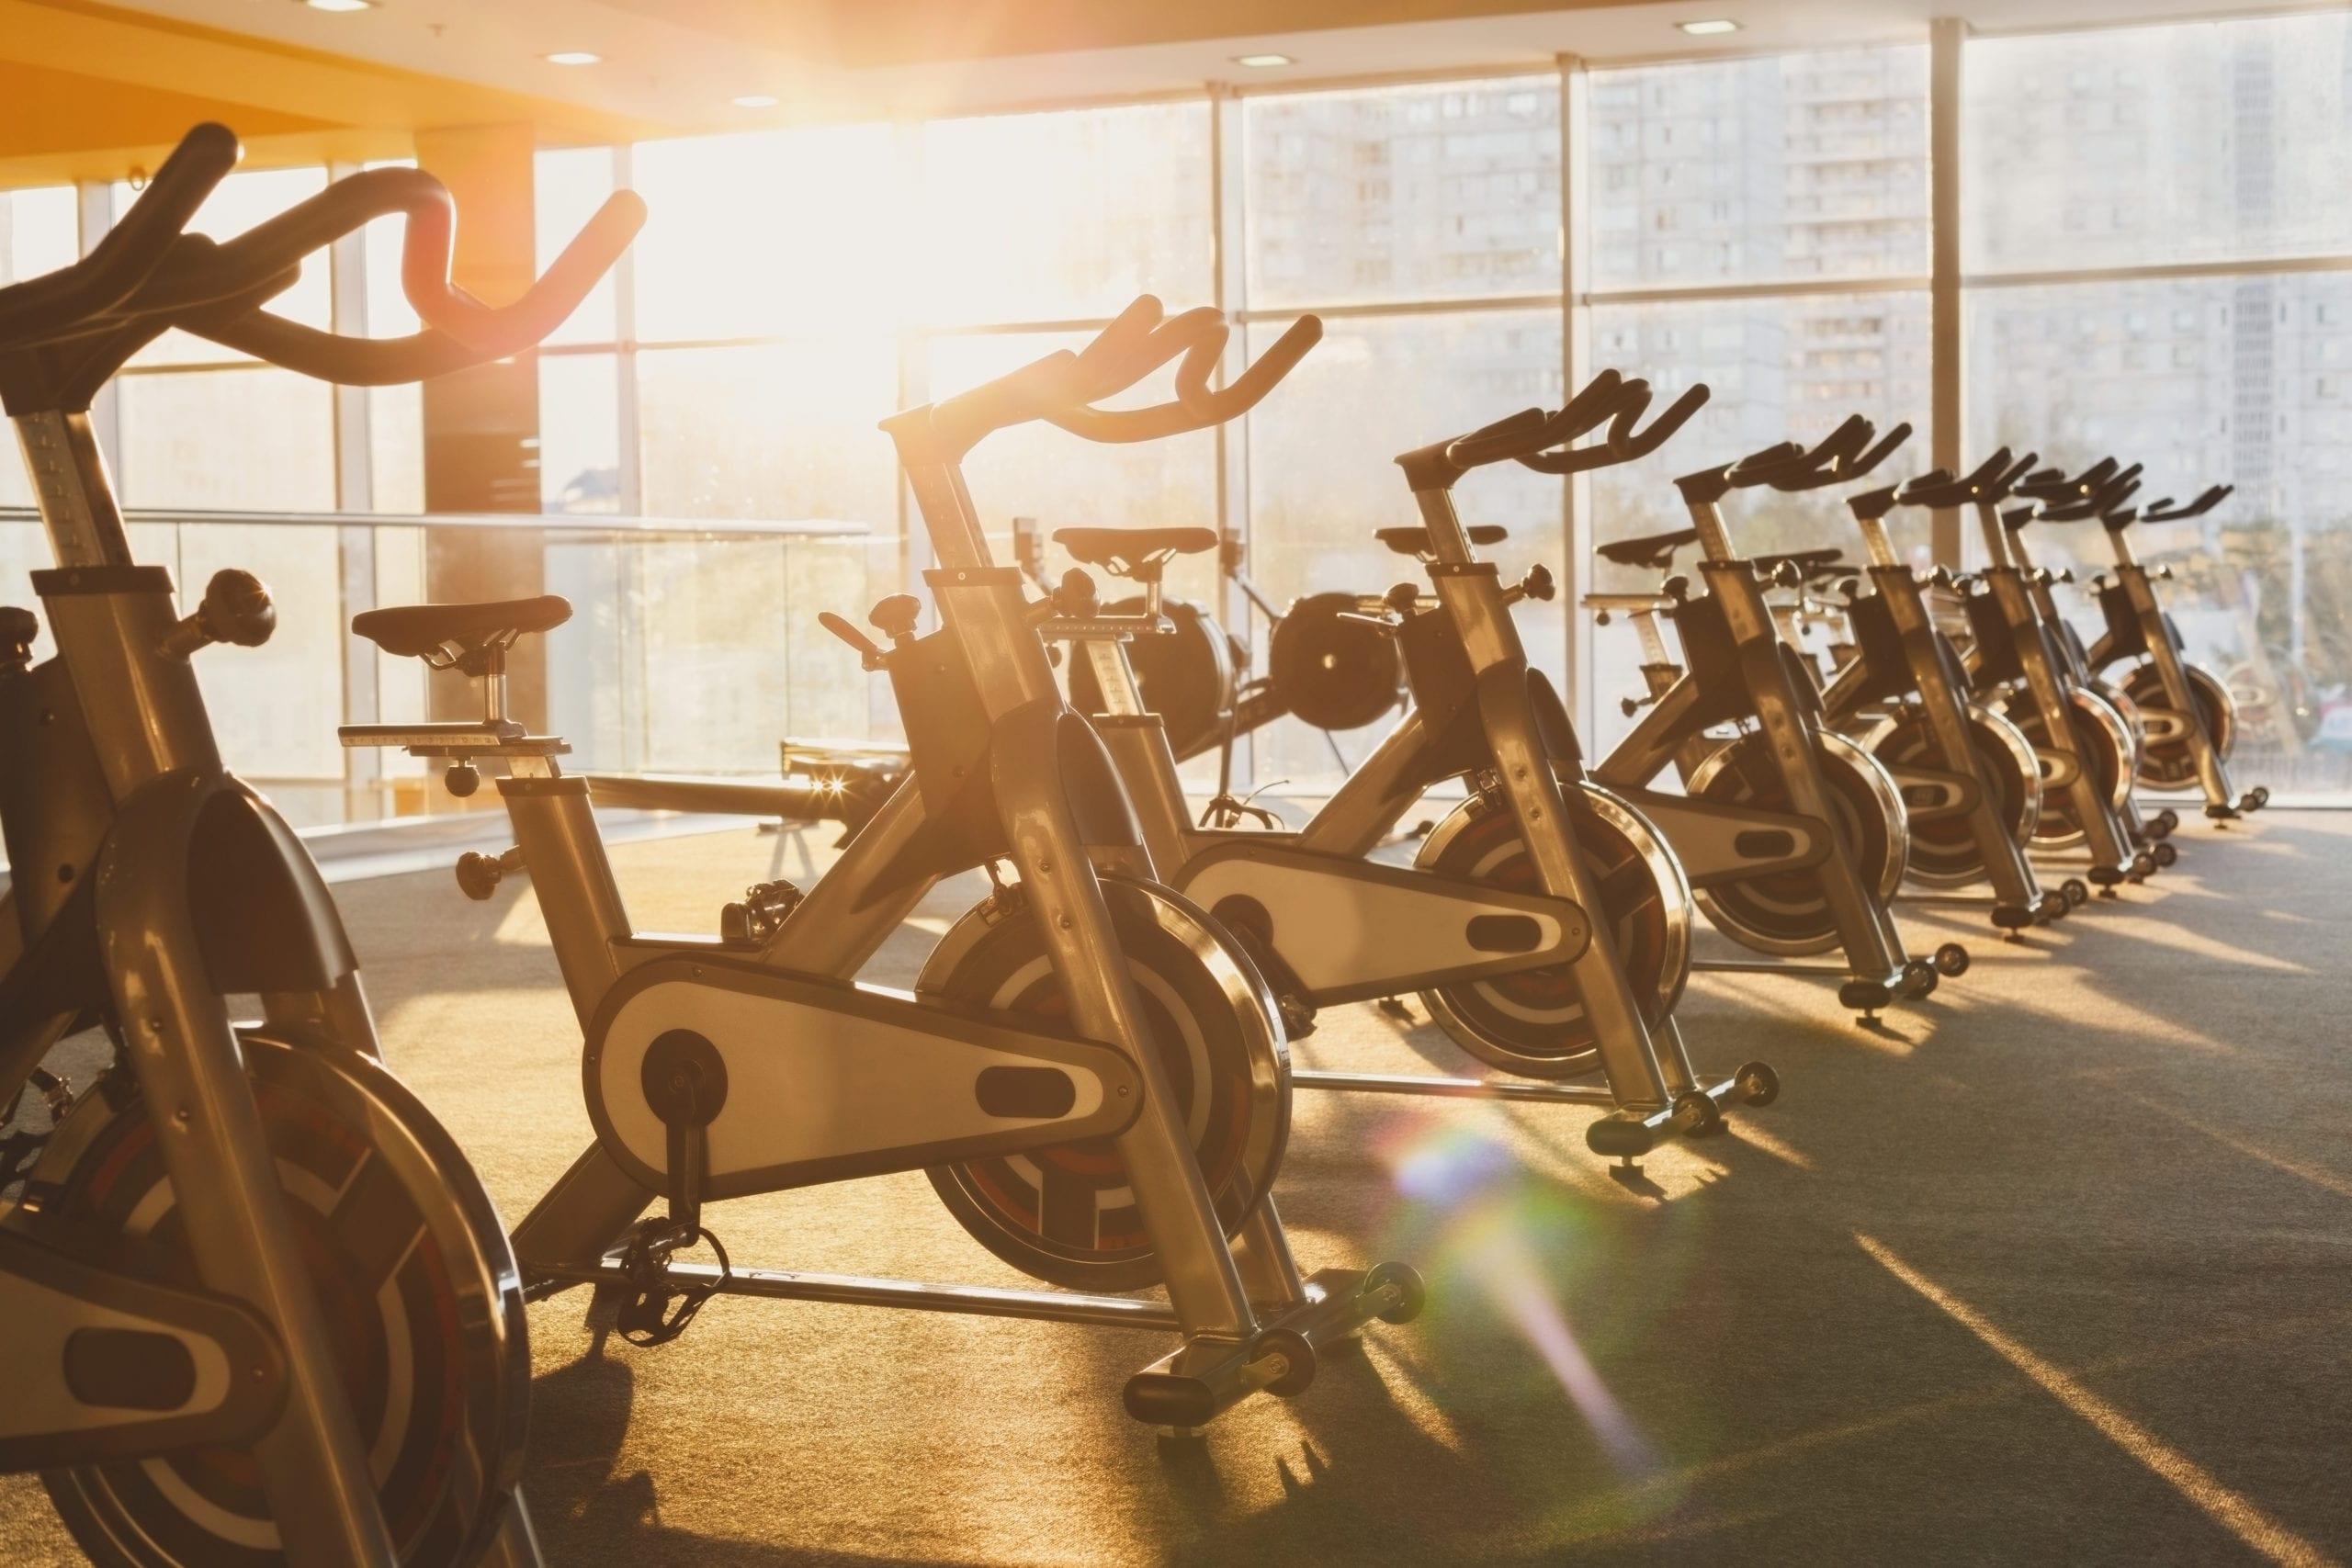 fitness gym exercise bikes